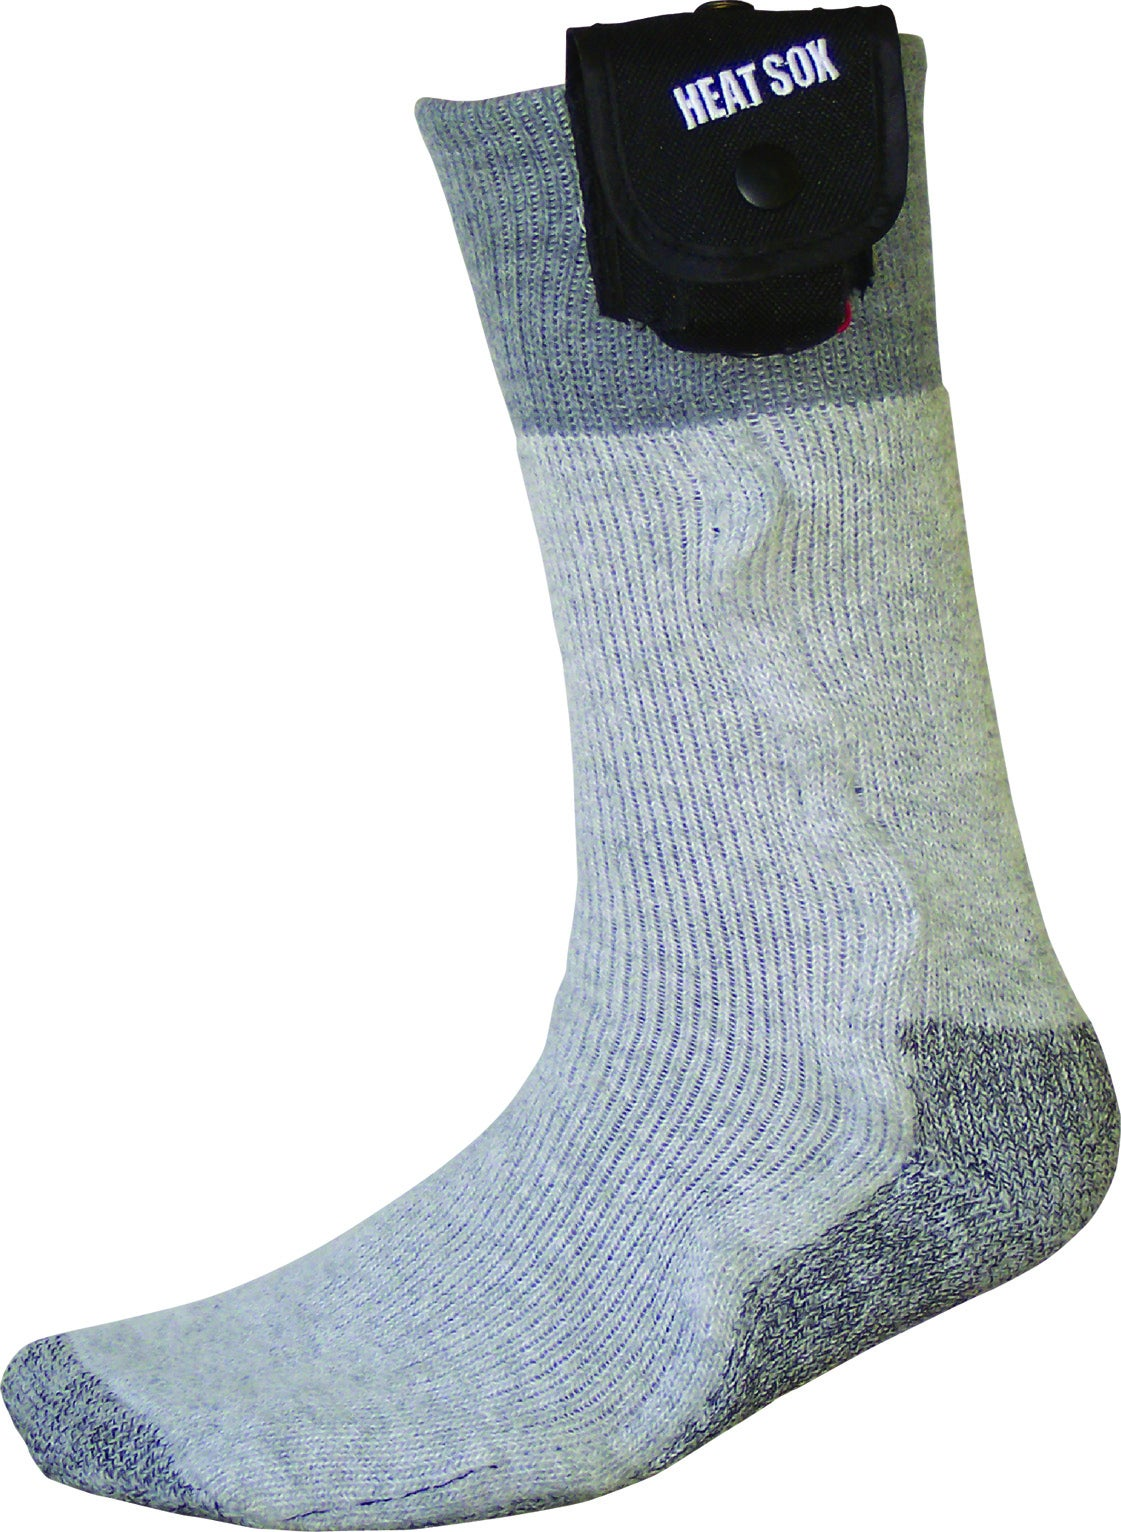 Heat Sox Men's Battery-heated Extra Large Wool-blend Socks